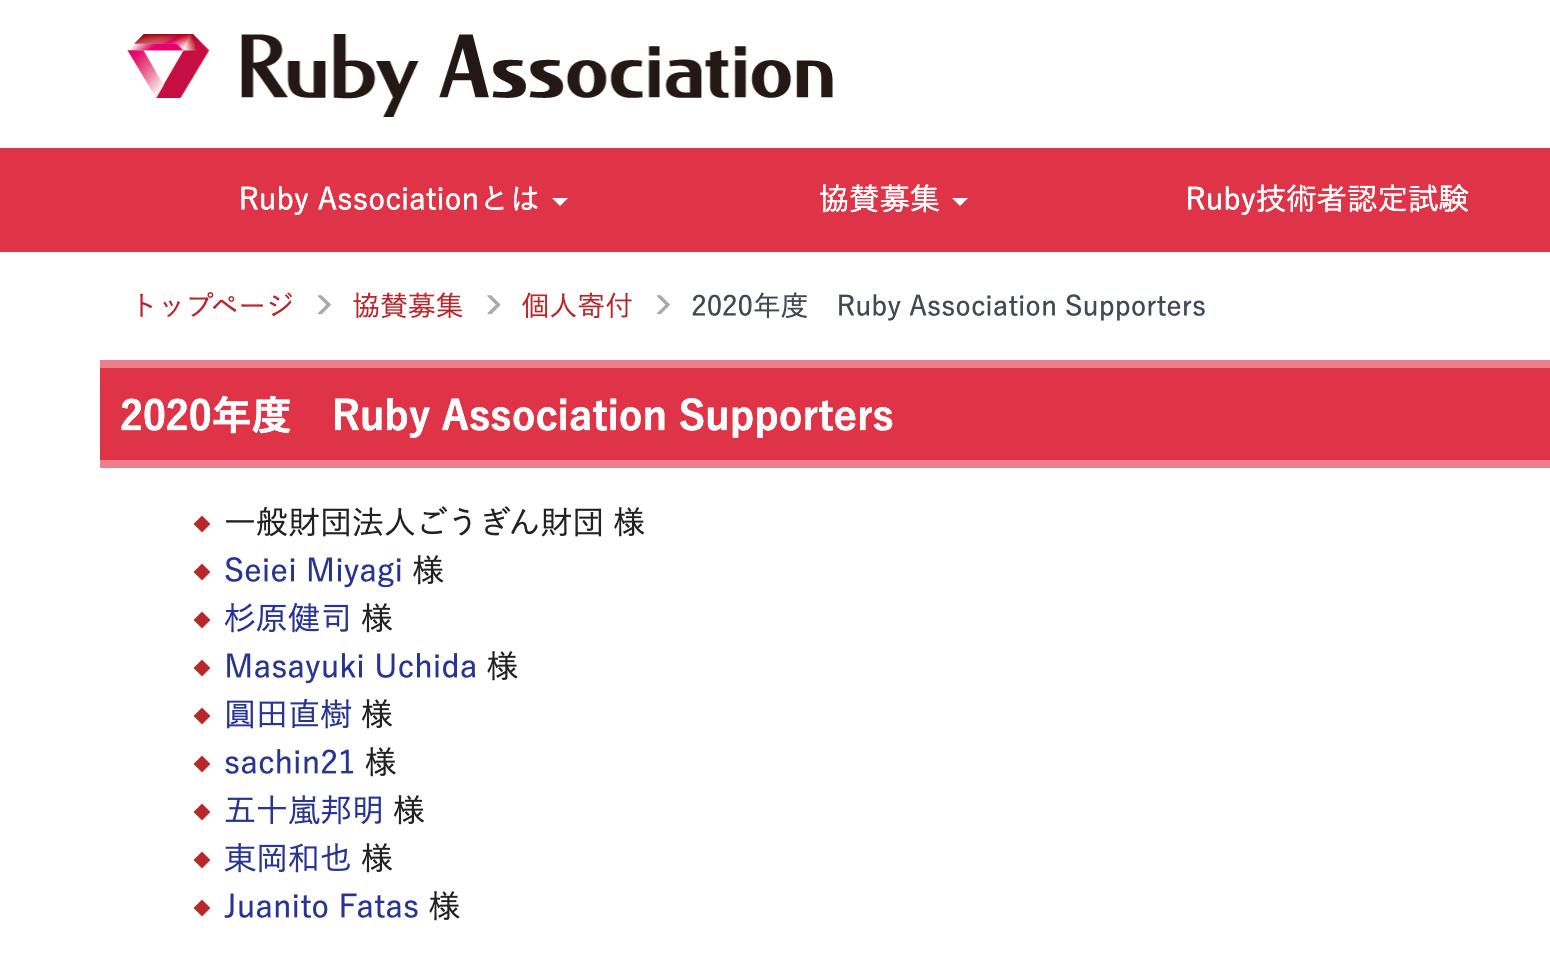 https://www.ruby.or.jp/ja/sponsors/donation/donor/2020